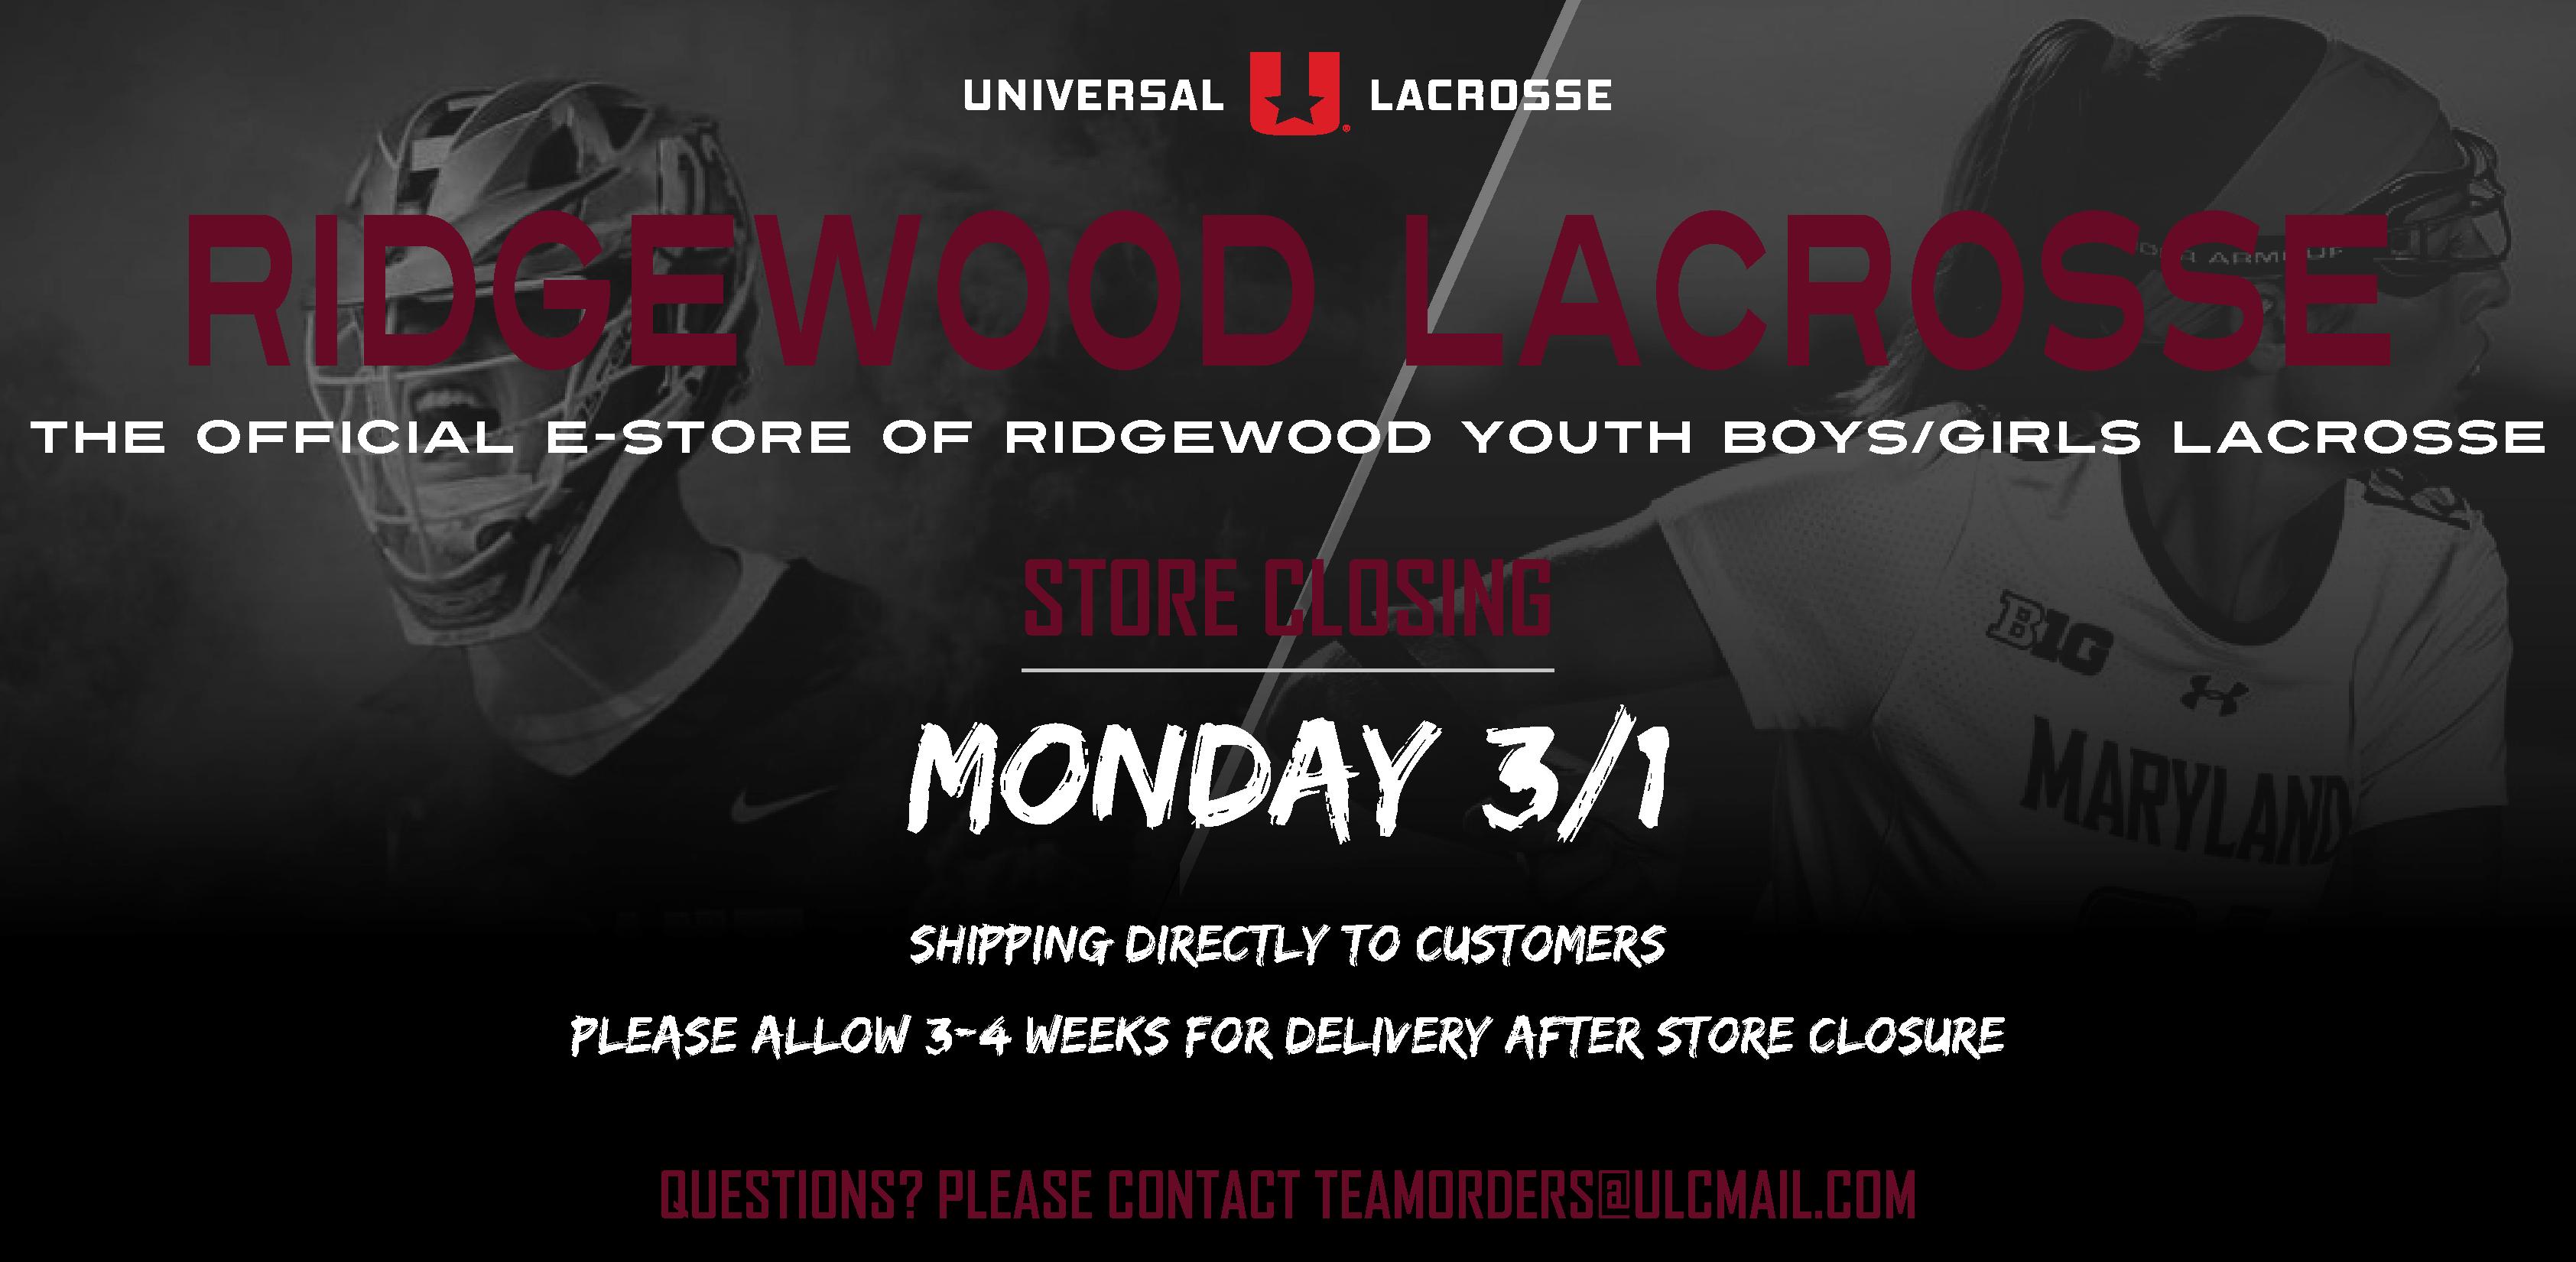 Ridgewood Youth B/G Lacrosse